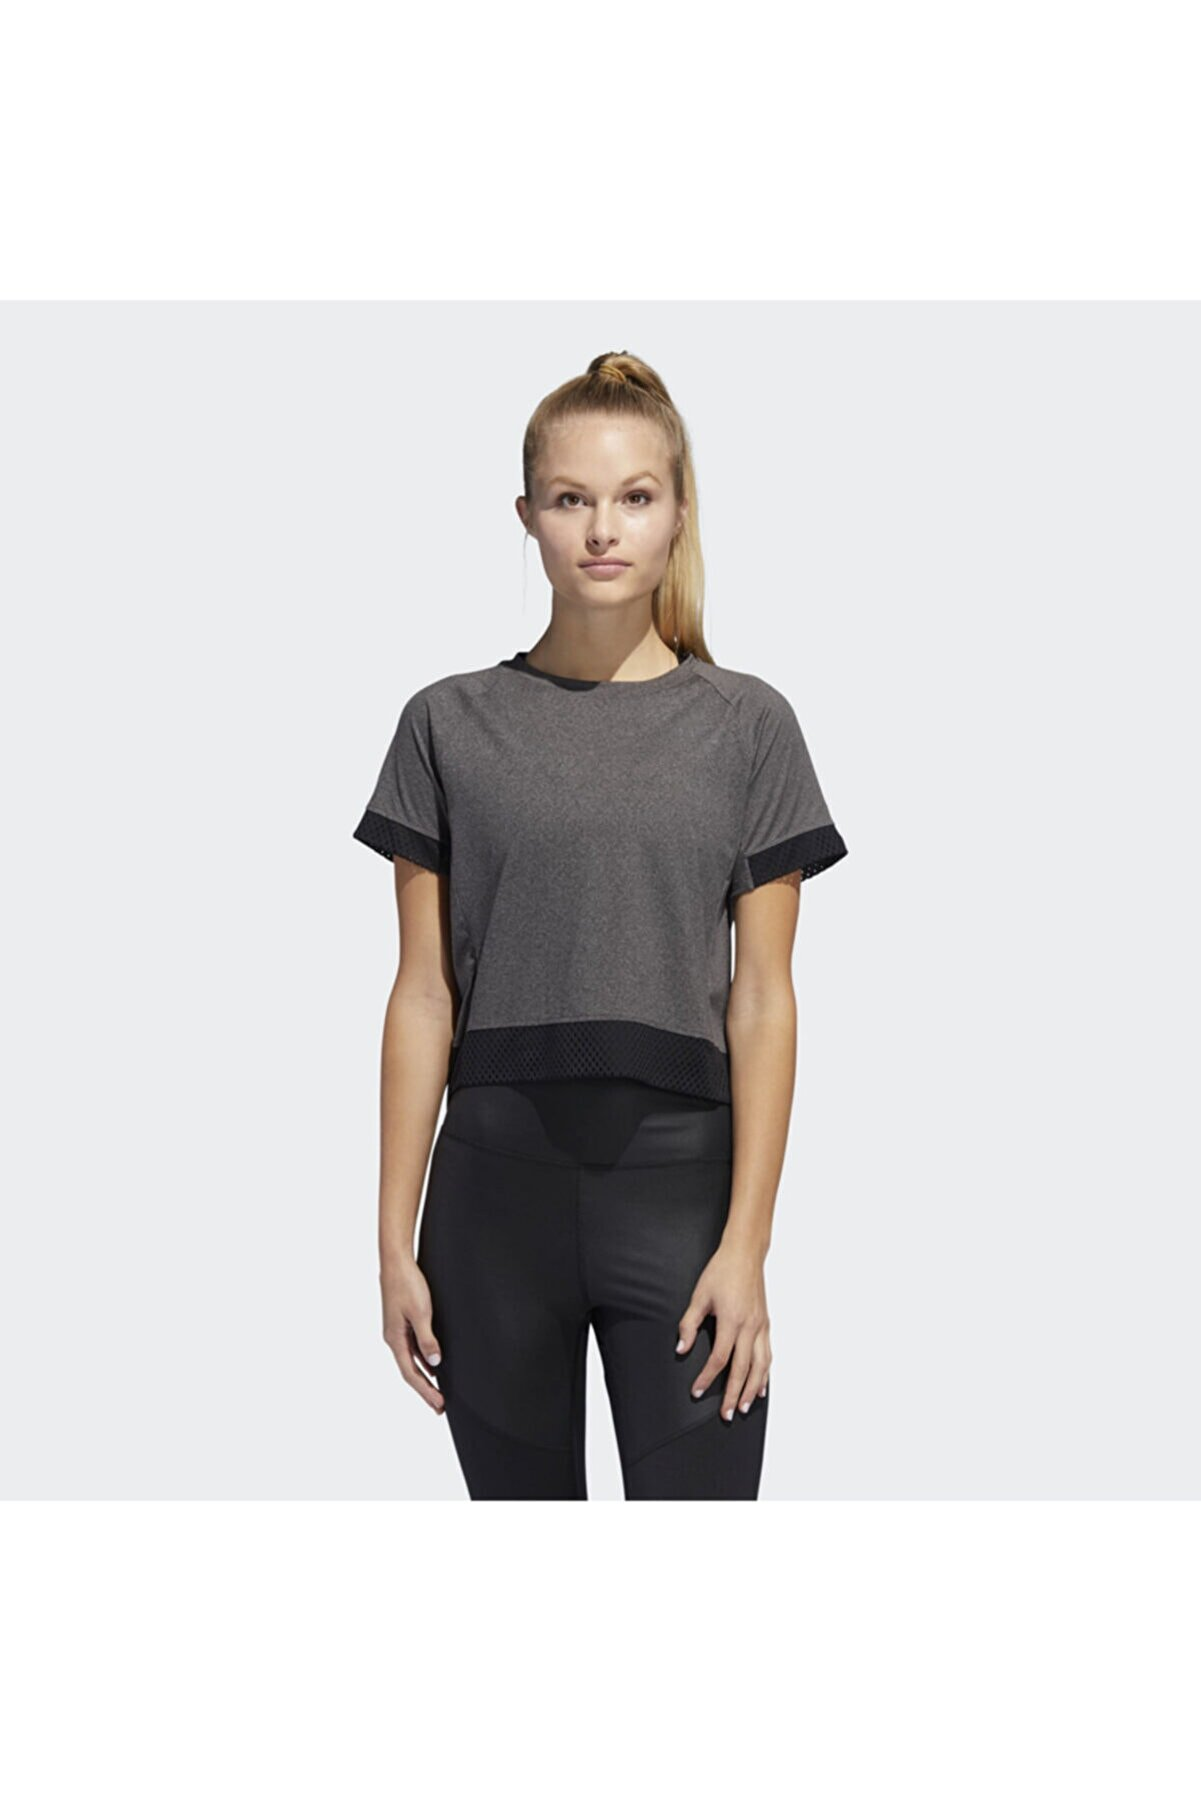 adidas BOXY MESH Siyah Kadın Kısa Kol Tişört 100575803